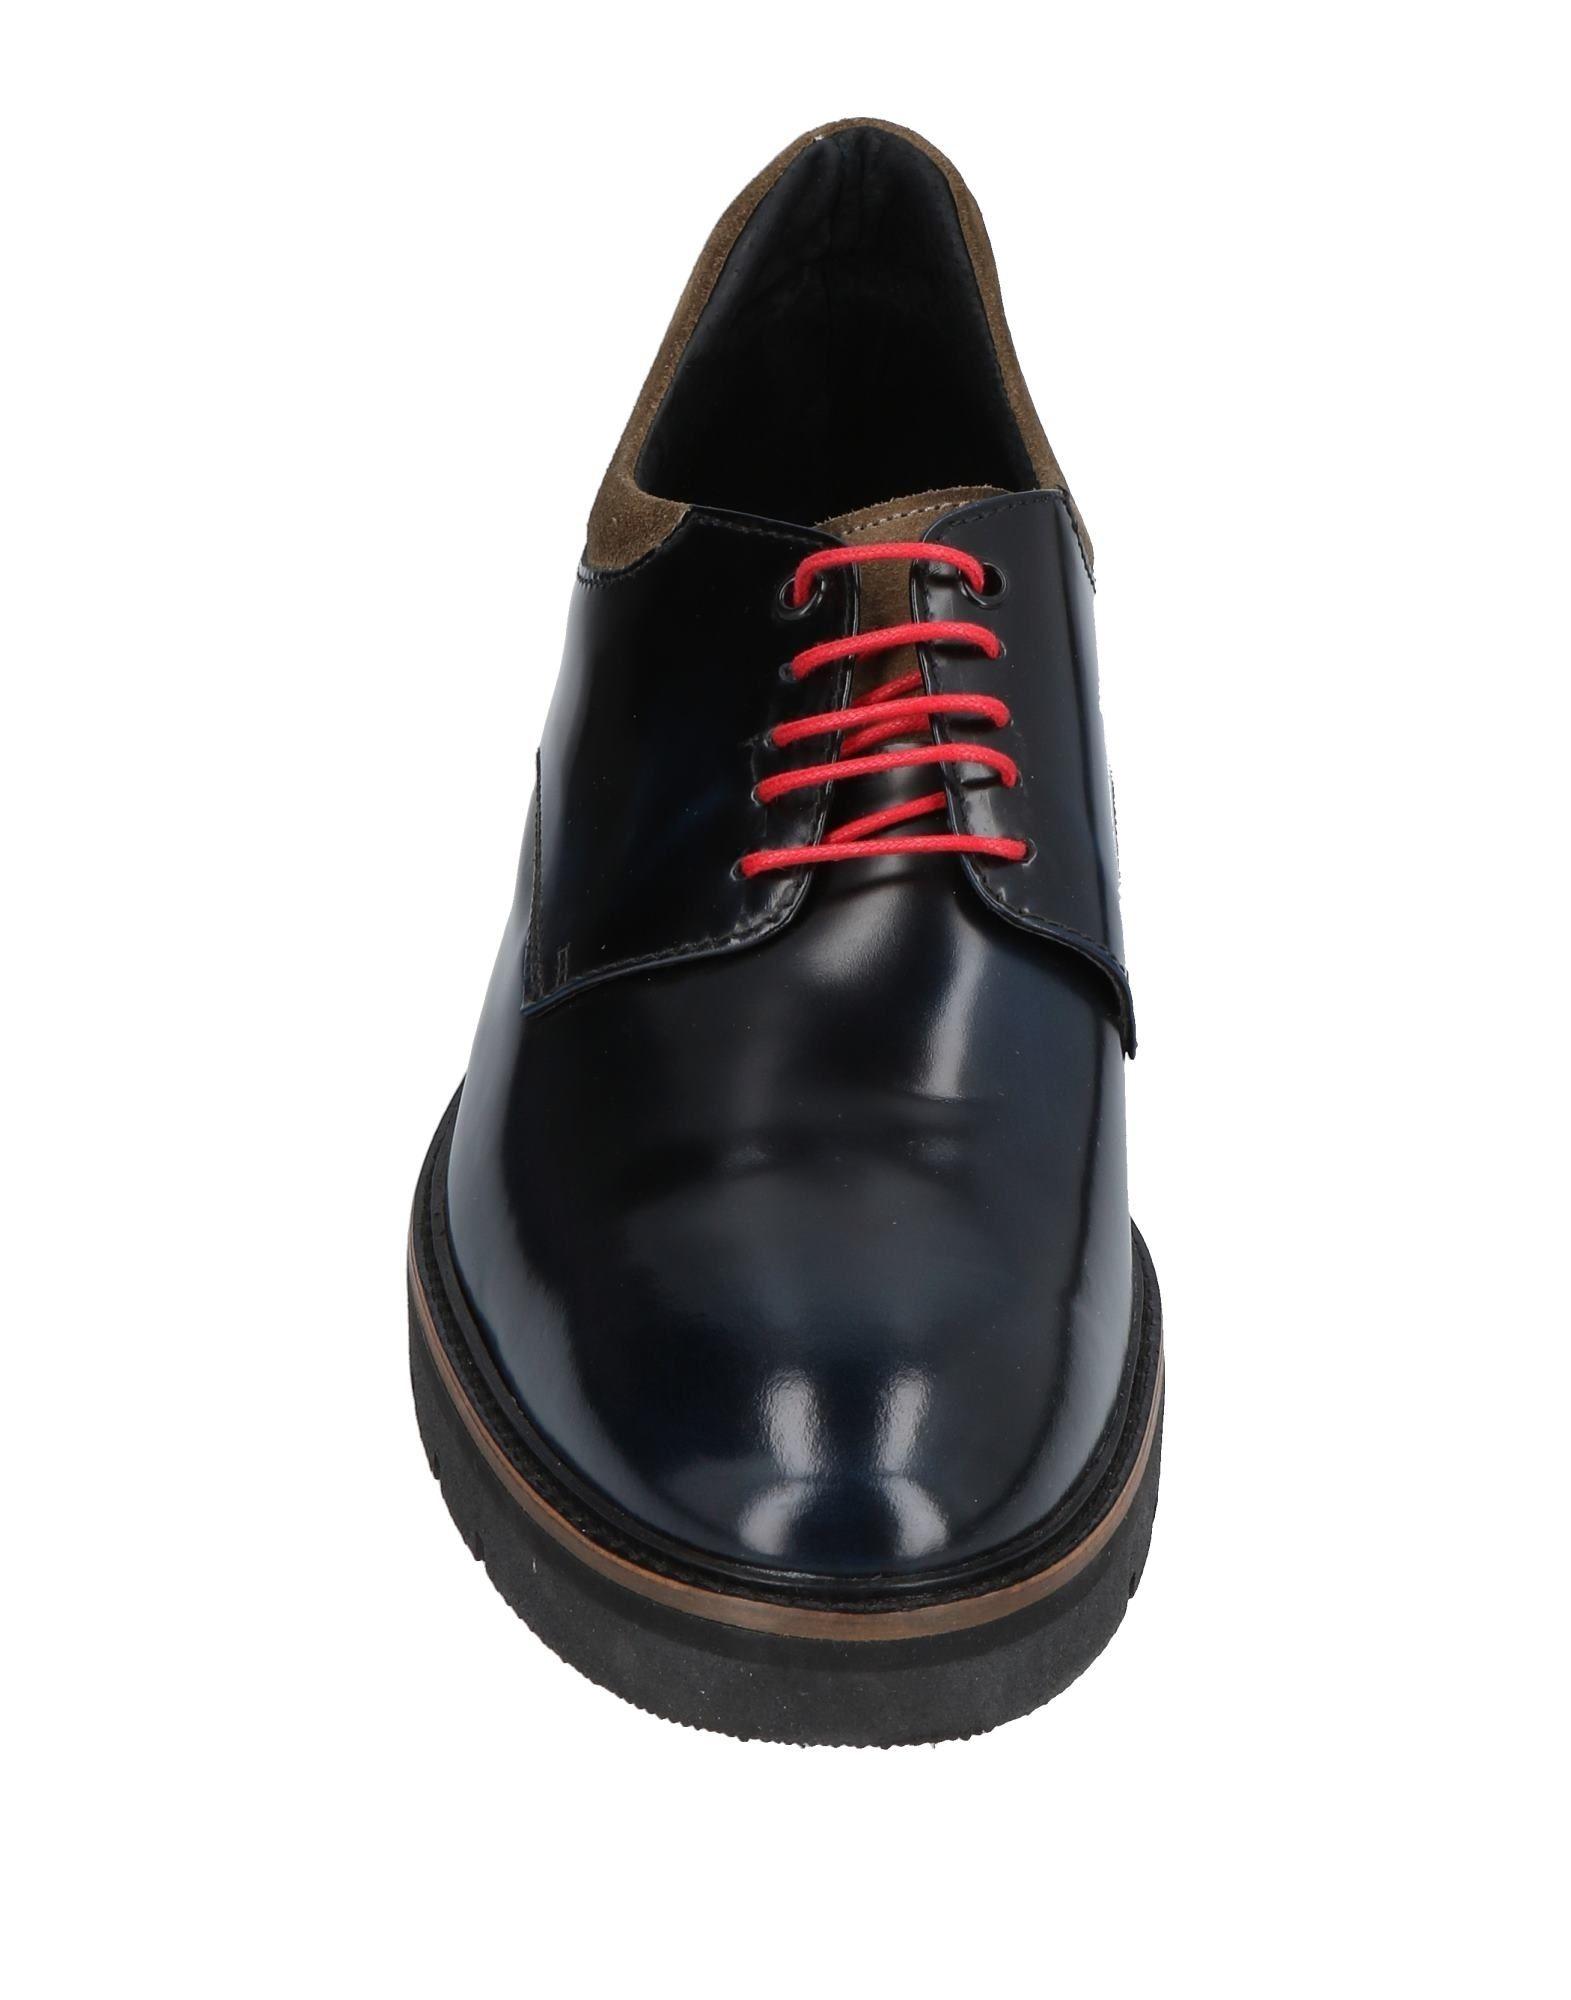 Rabatt Herren echte Schuhe Exibit Schnürschuhe Herren Rabatt  11464914GL 76d47d